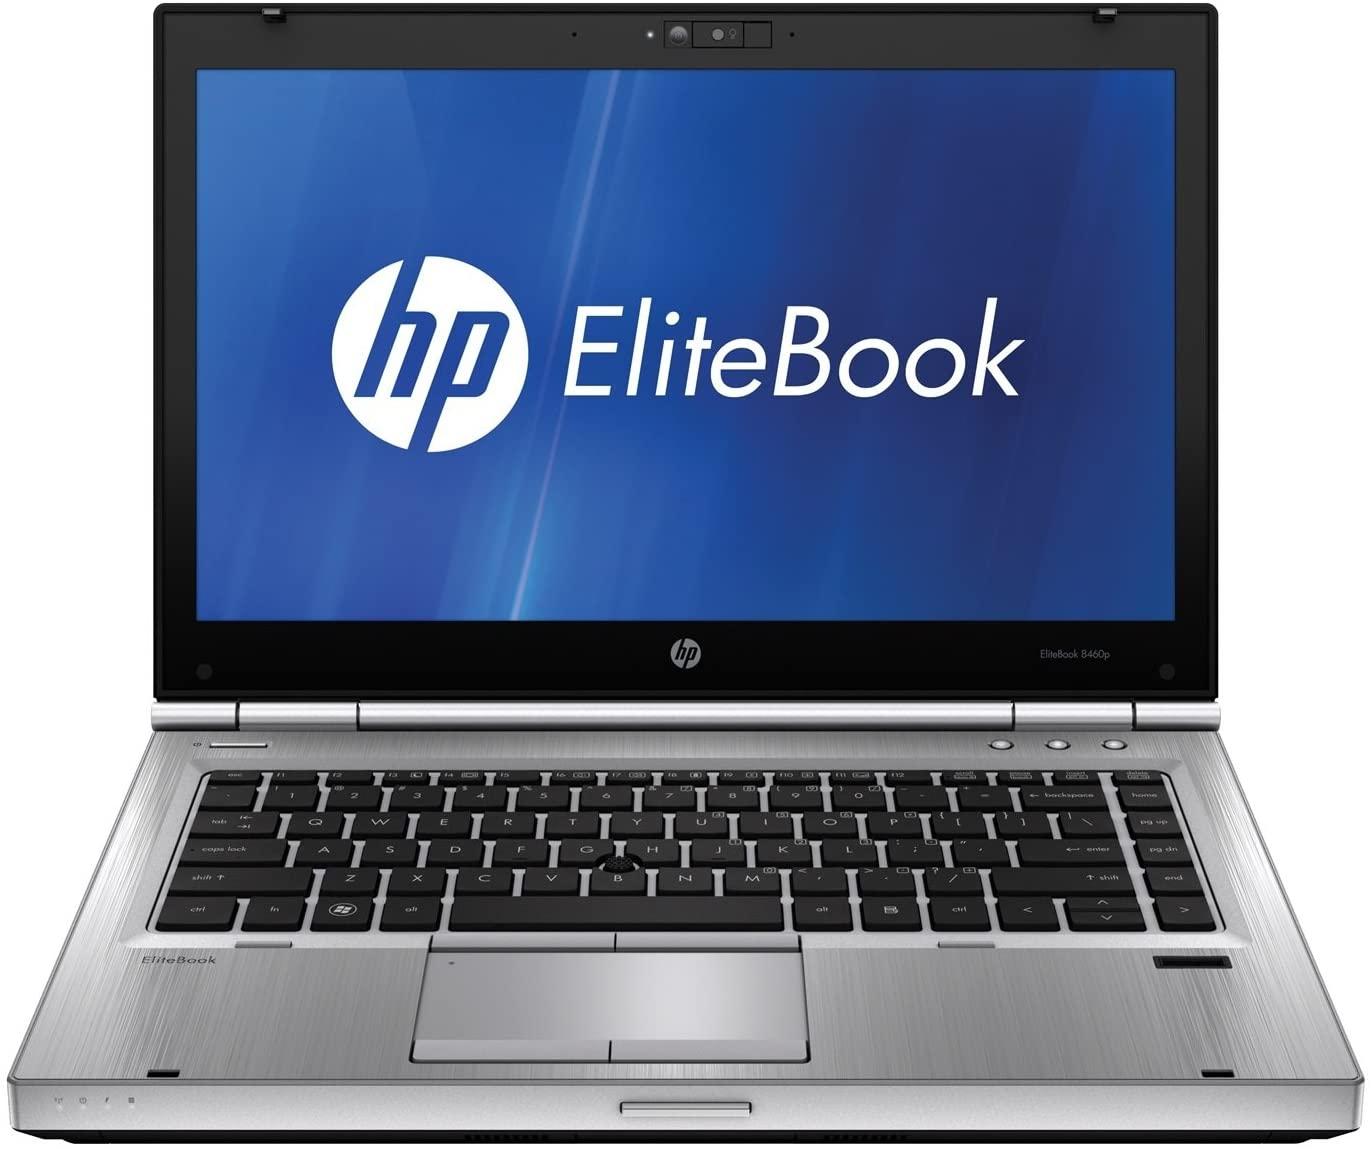 laptop-cu-hp-8460p-core-i7-gia-re-hcm-1